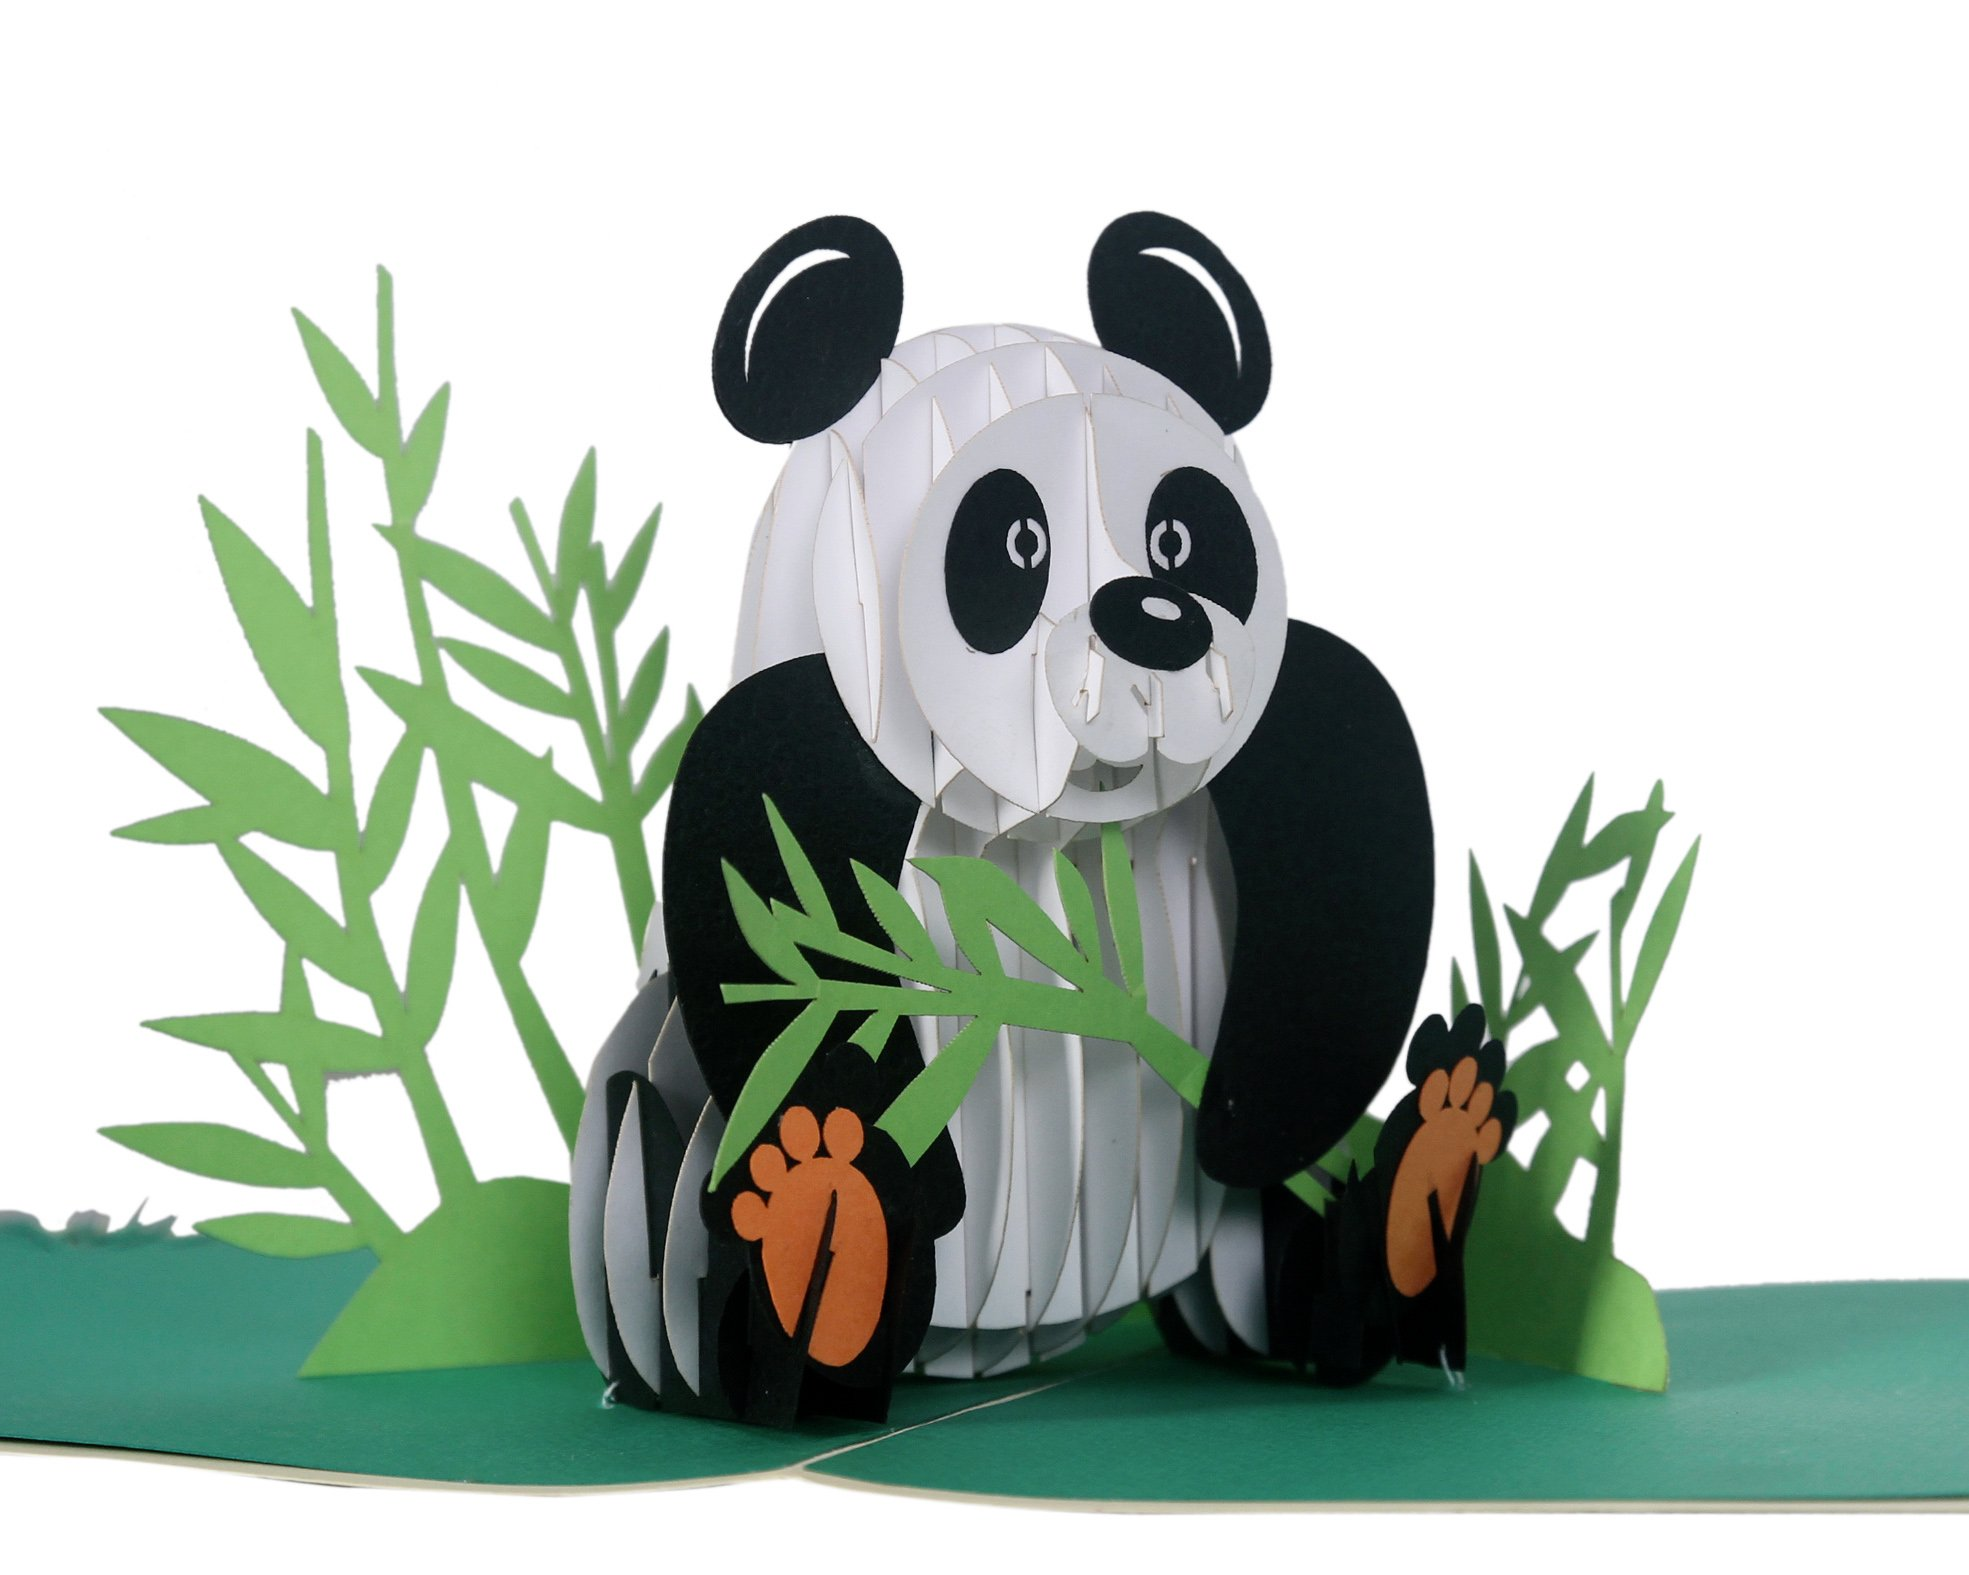 bc1737f4f439 CUTPOPUP 3D Panda Paper Pop Up Greeting Card Cute Laser Cut Panda Animal  Pop Out Card